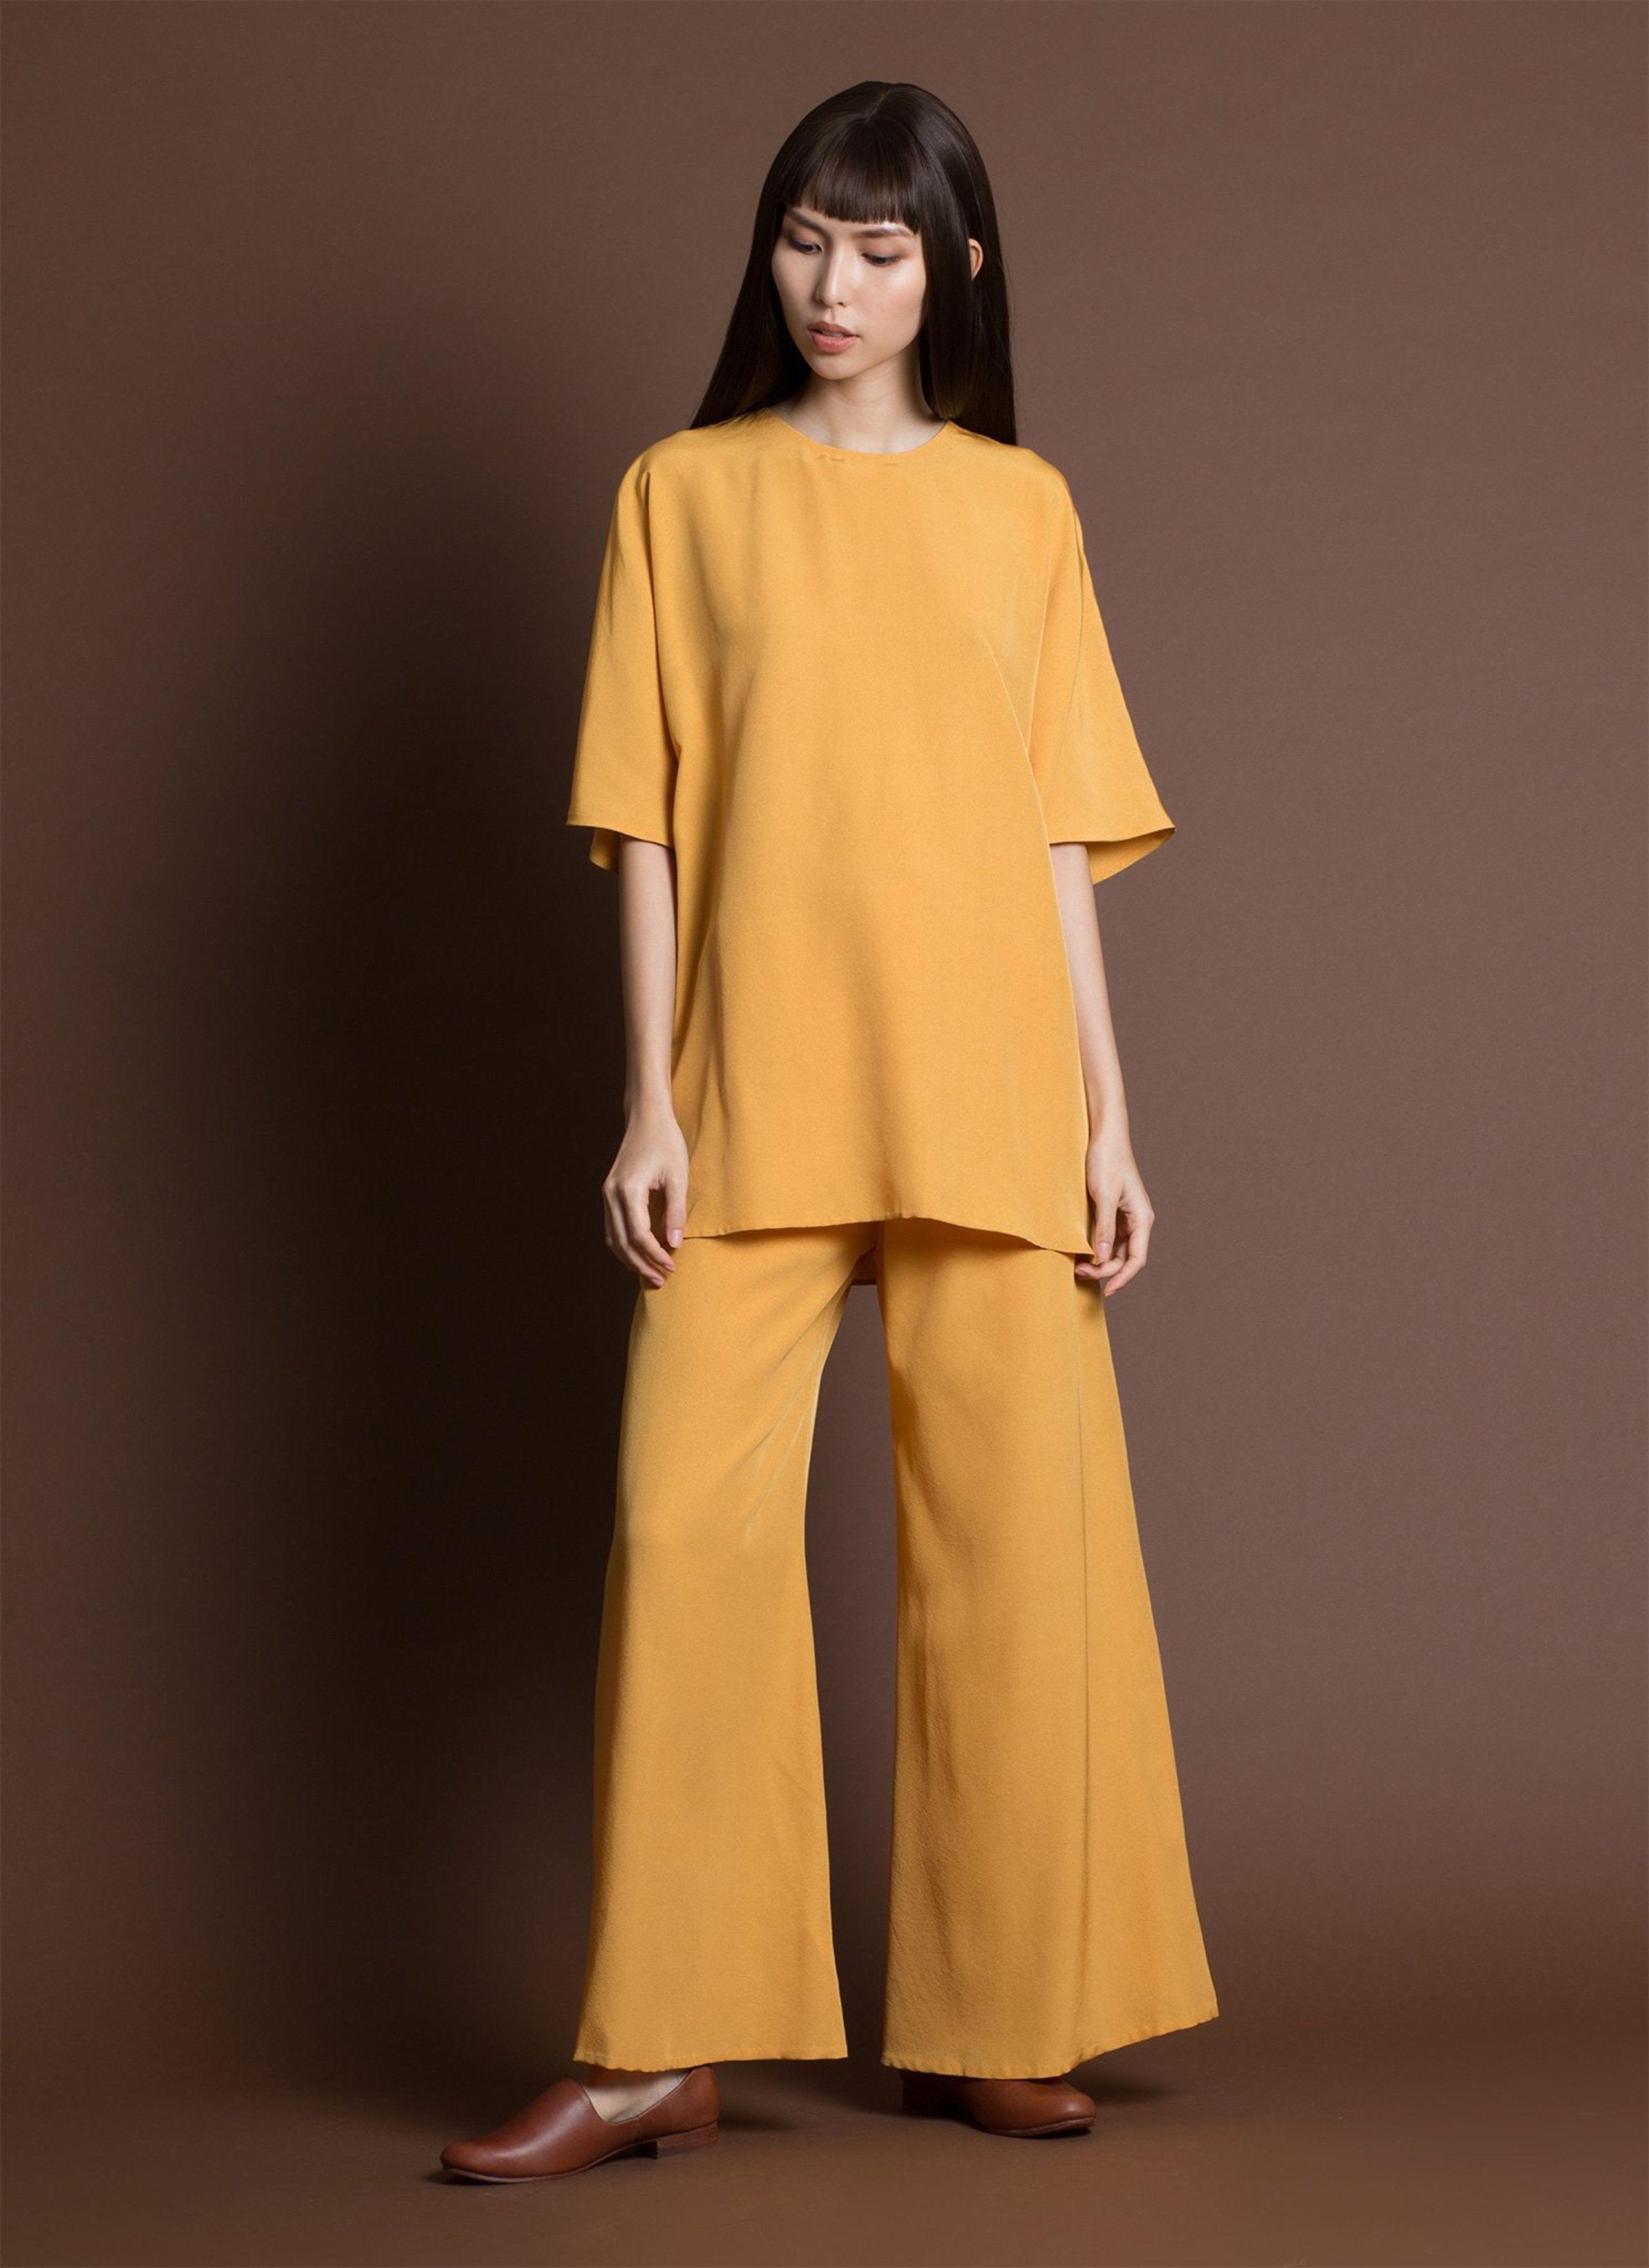 c41076b00 Song Tu Wide Leg Silk Pants - Persimmon Yellow in 2019 | KAAREM New ...